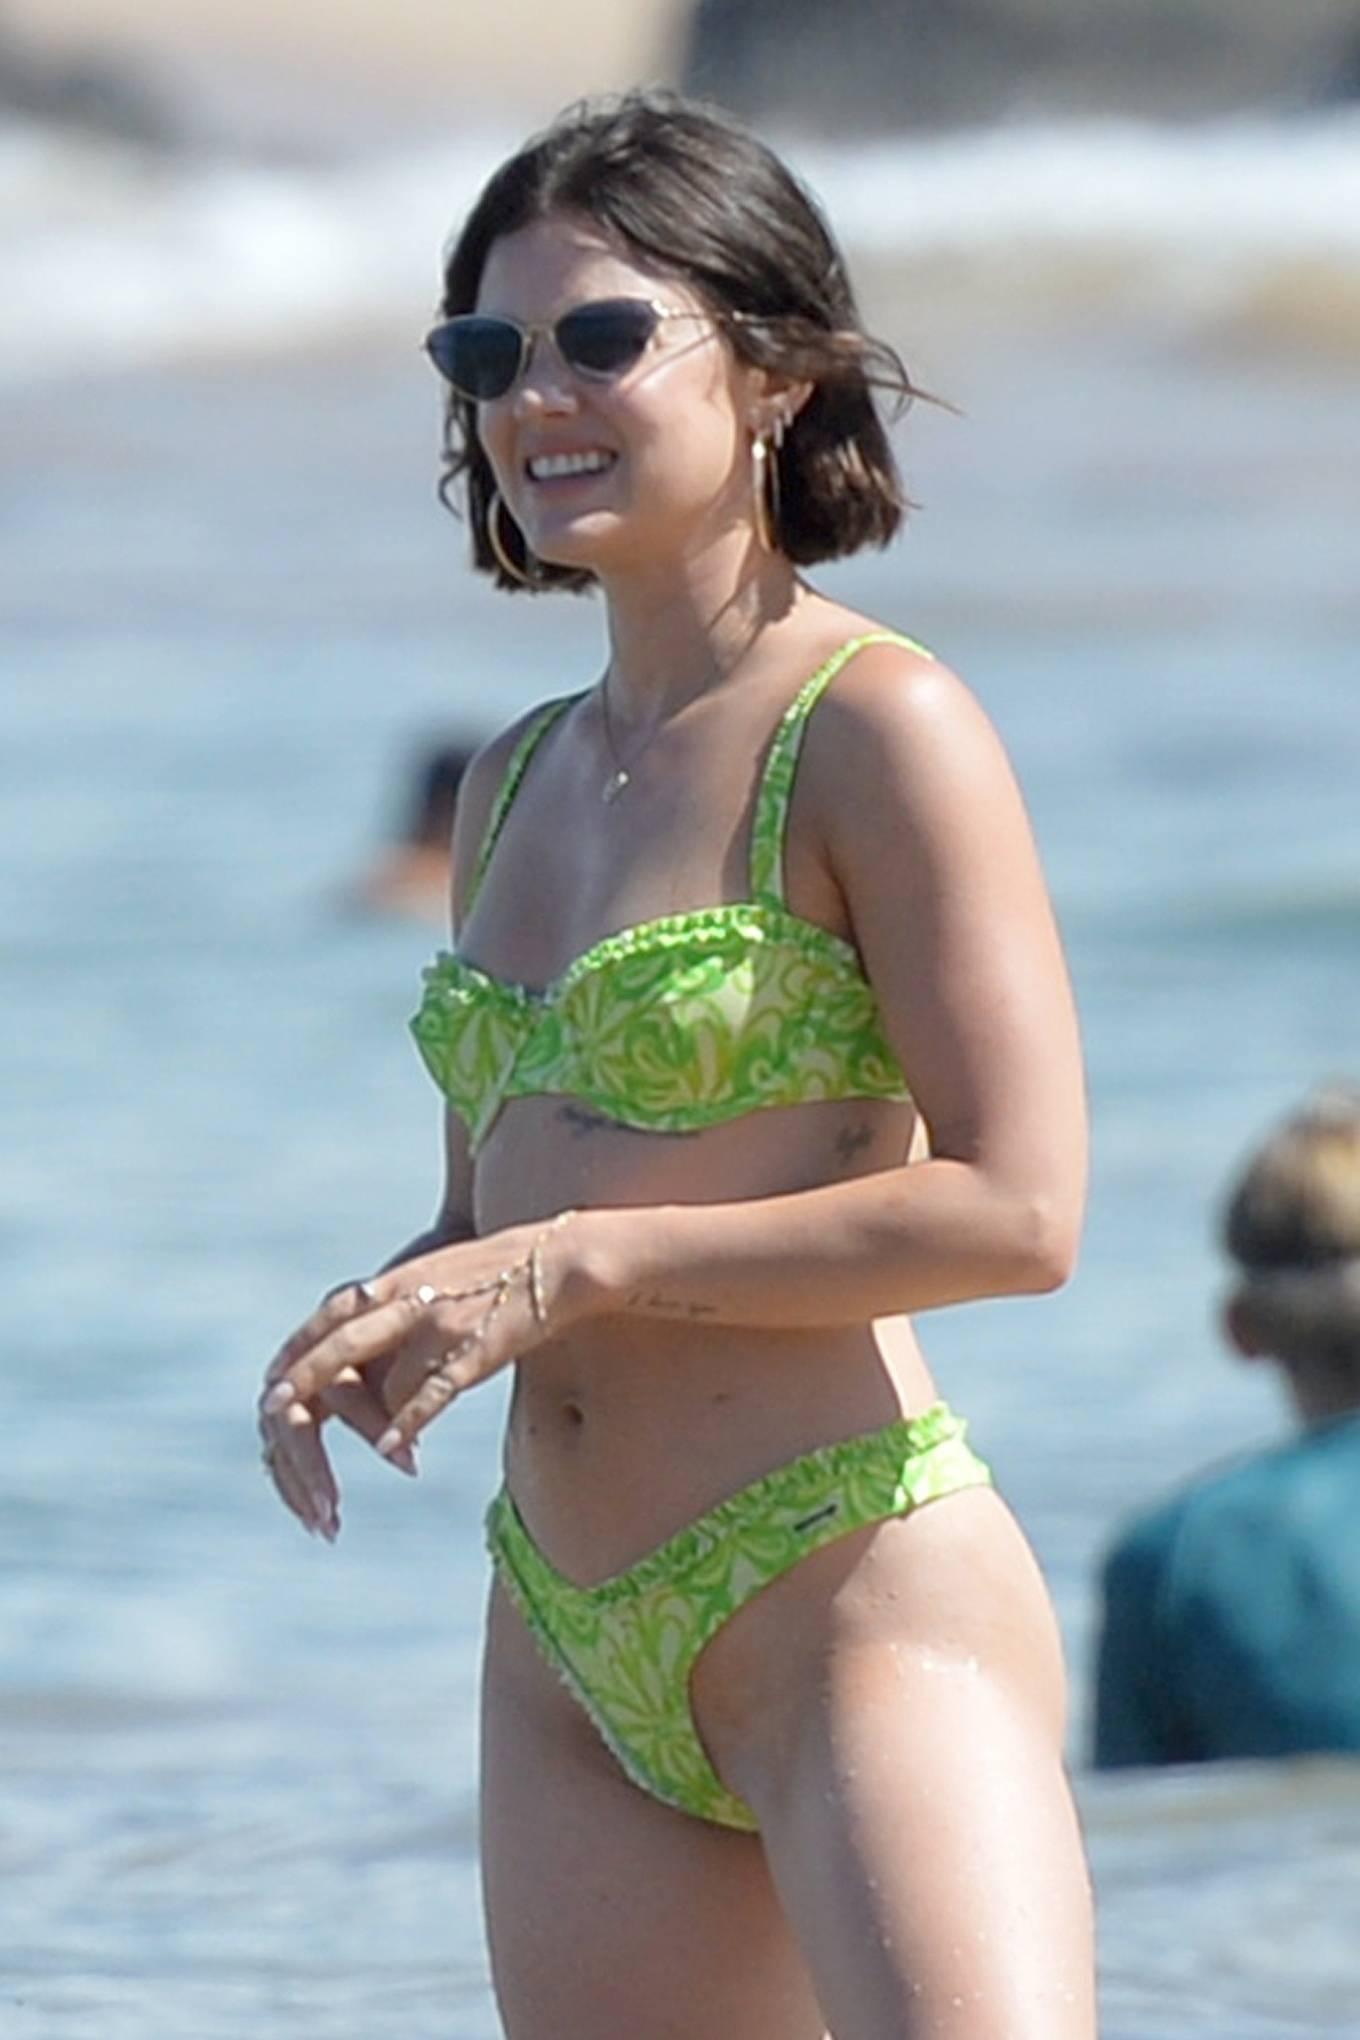 Lucy Hale - In a green bikini at Beach in Hawaii